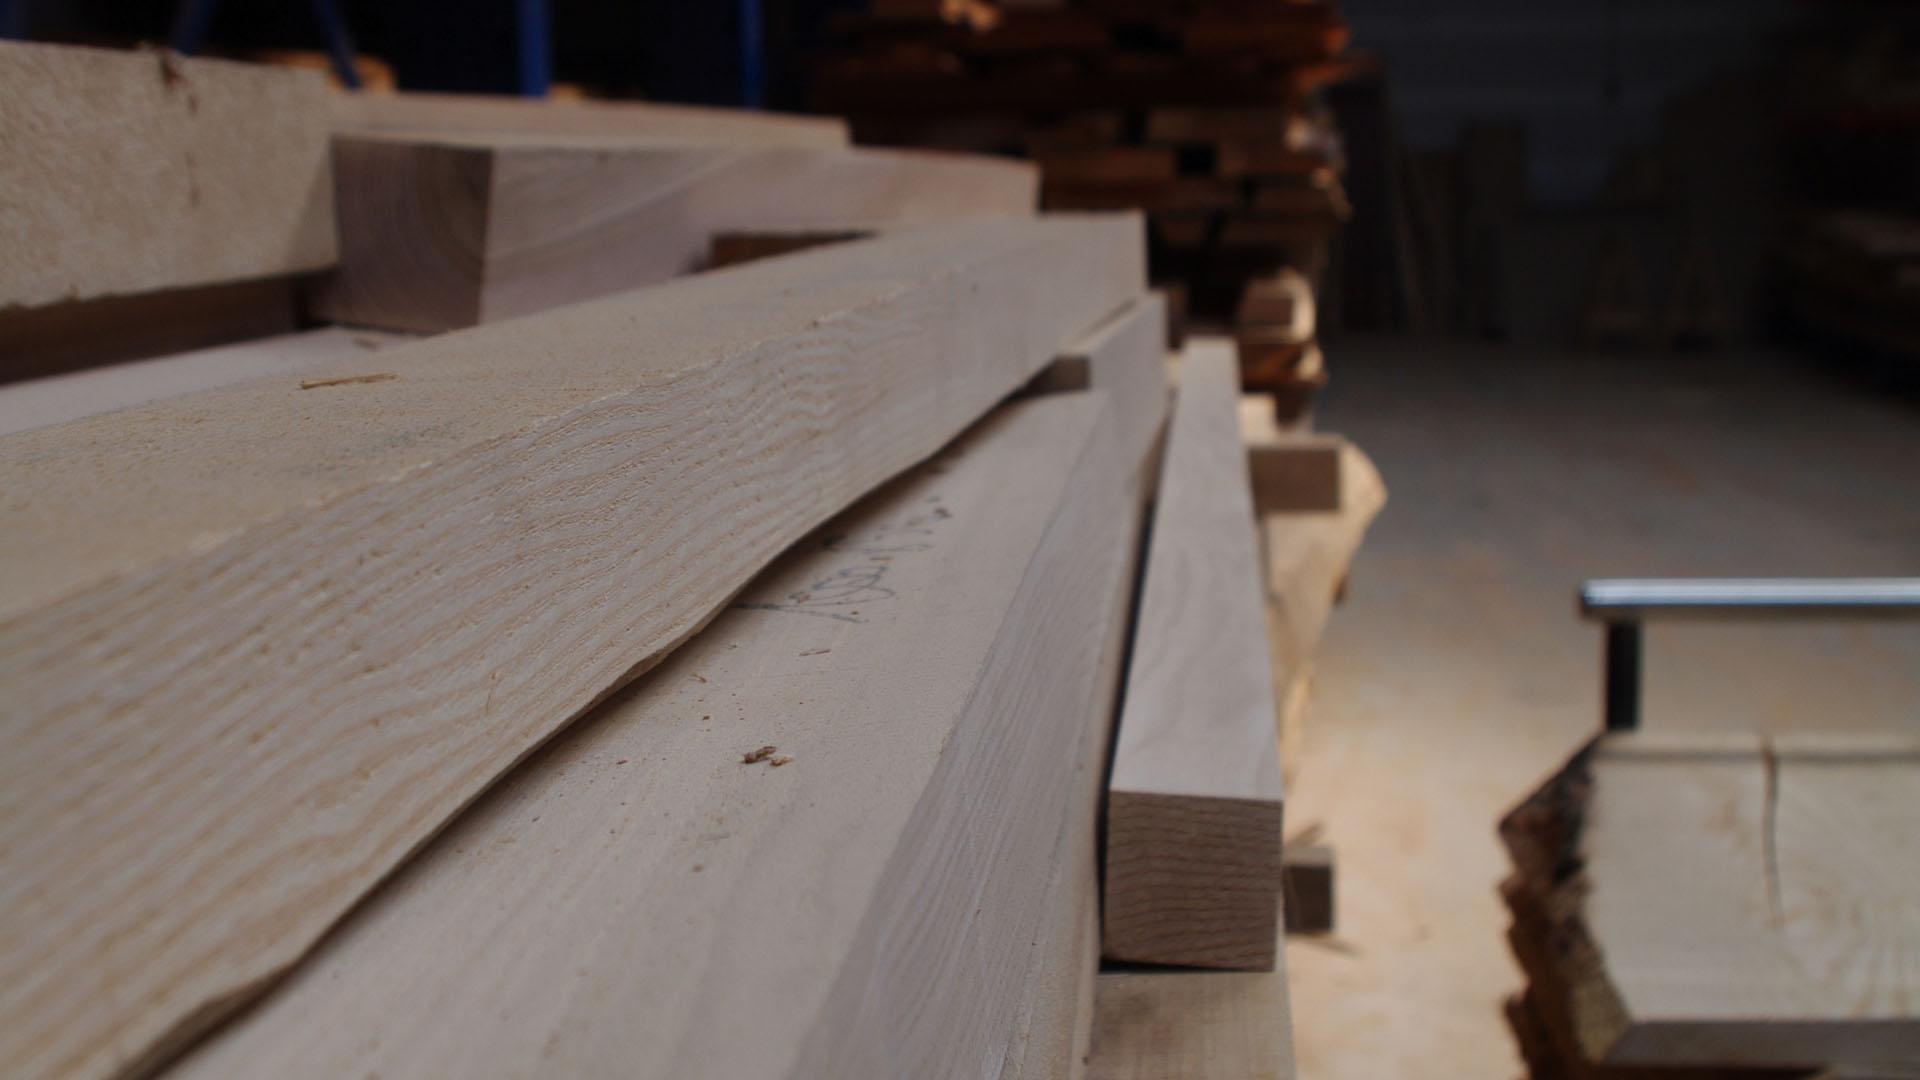 Cav in wood